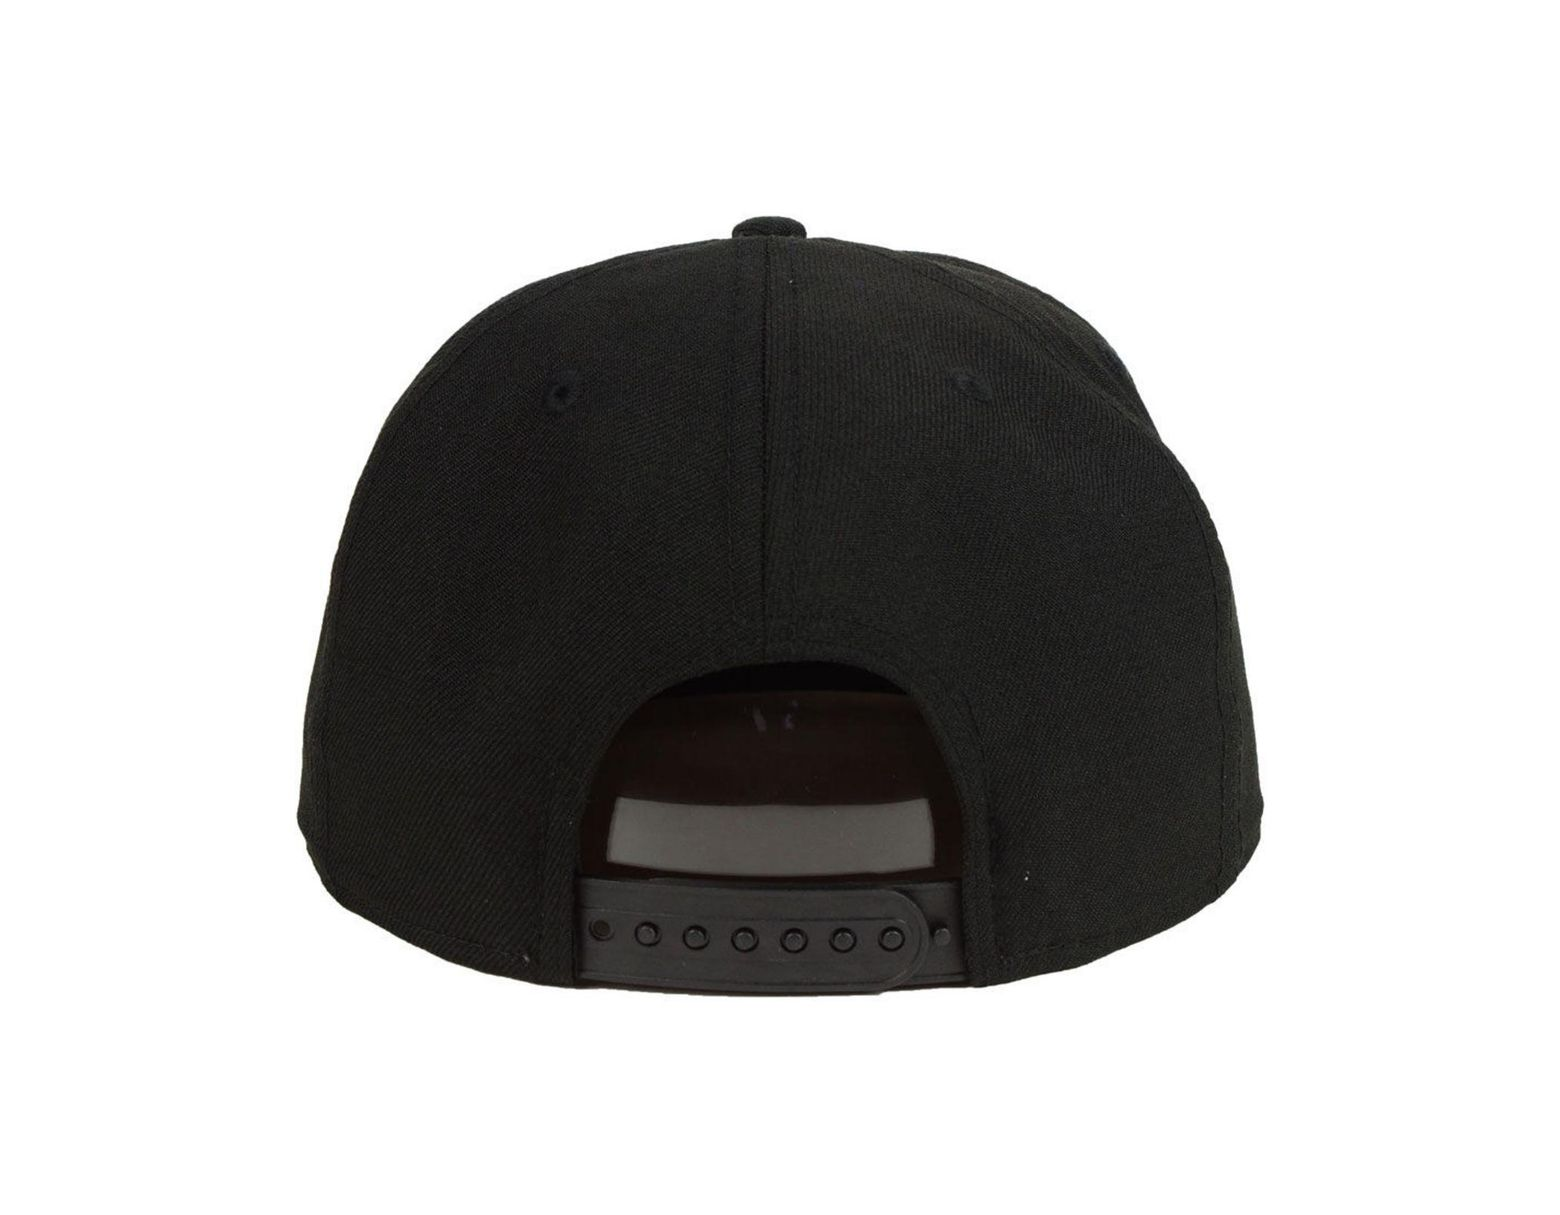 buy popular 3147b a91c1 KTZ Michigan Wolverines Black White Fashion 9fifty Snapback Cap in Black  for Men - Lyst